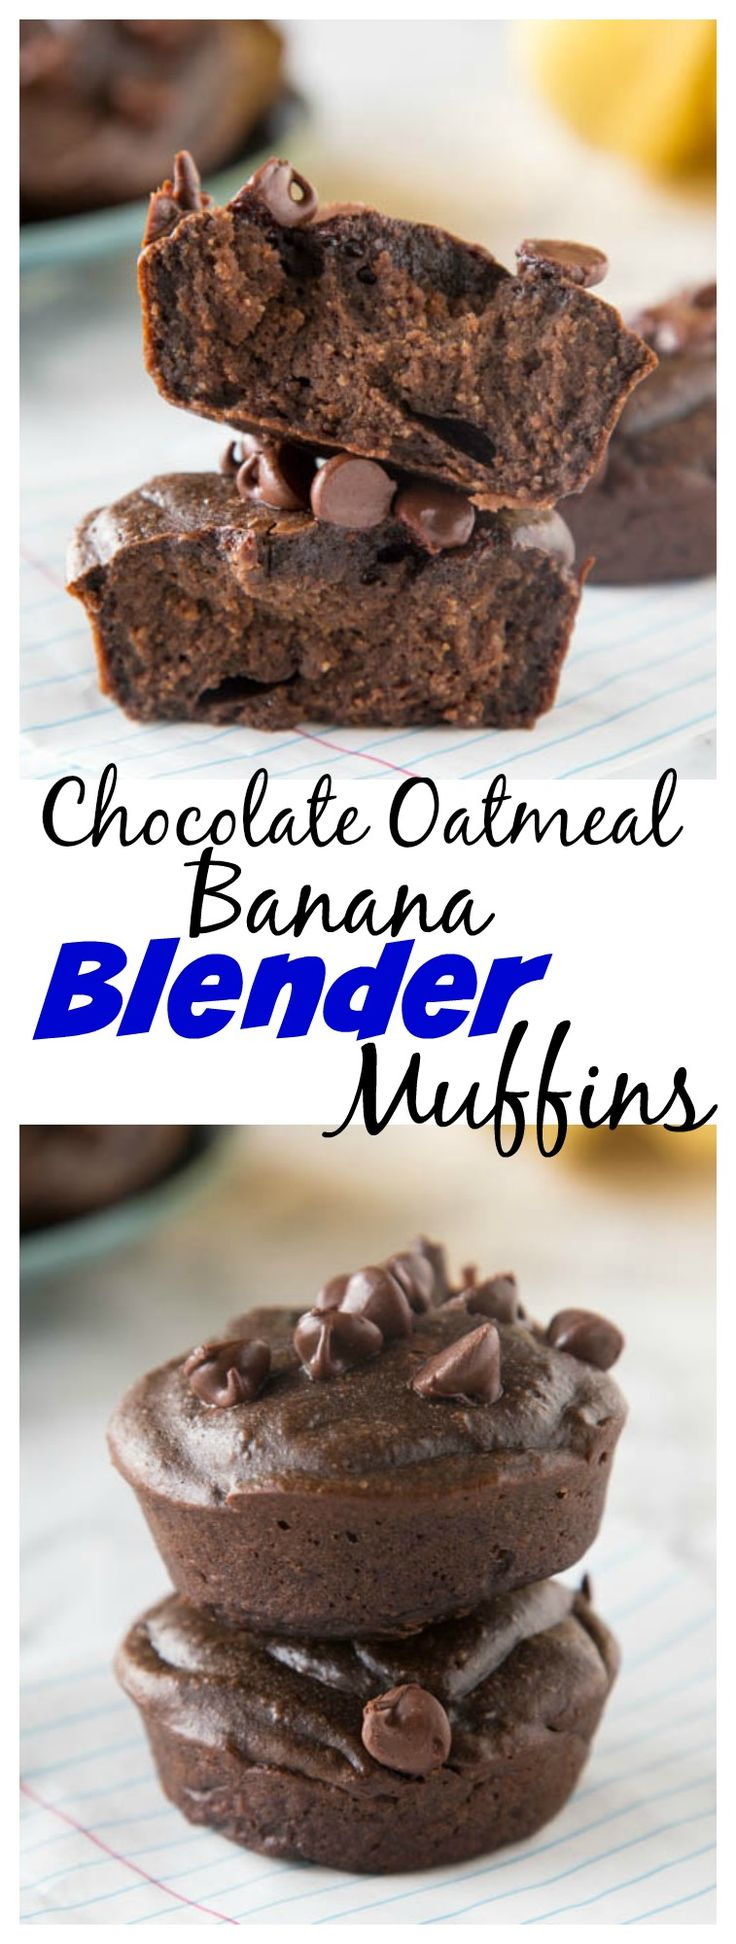 Chocolate Banana Oatmeal Blender Muffins – gluten free, healthy, muffins that…